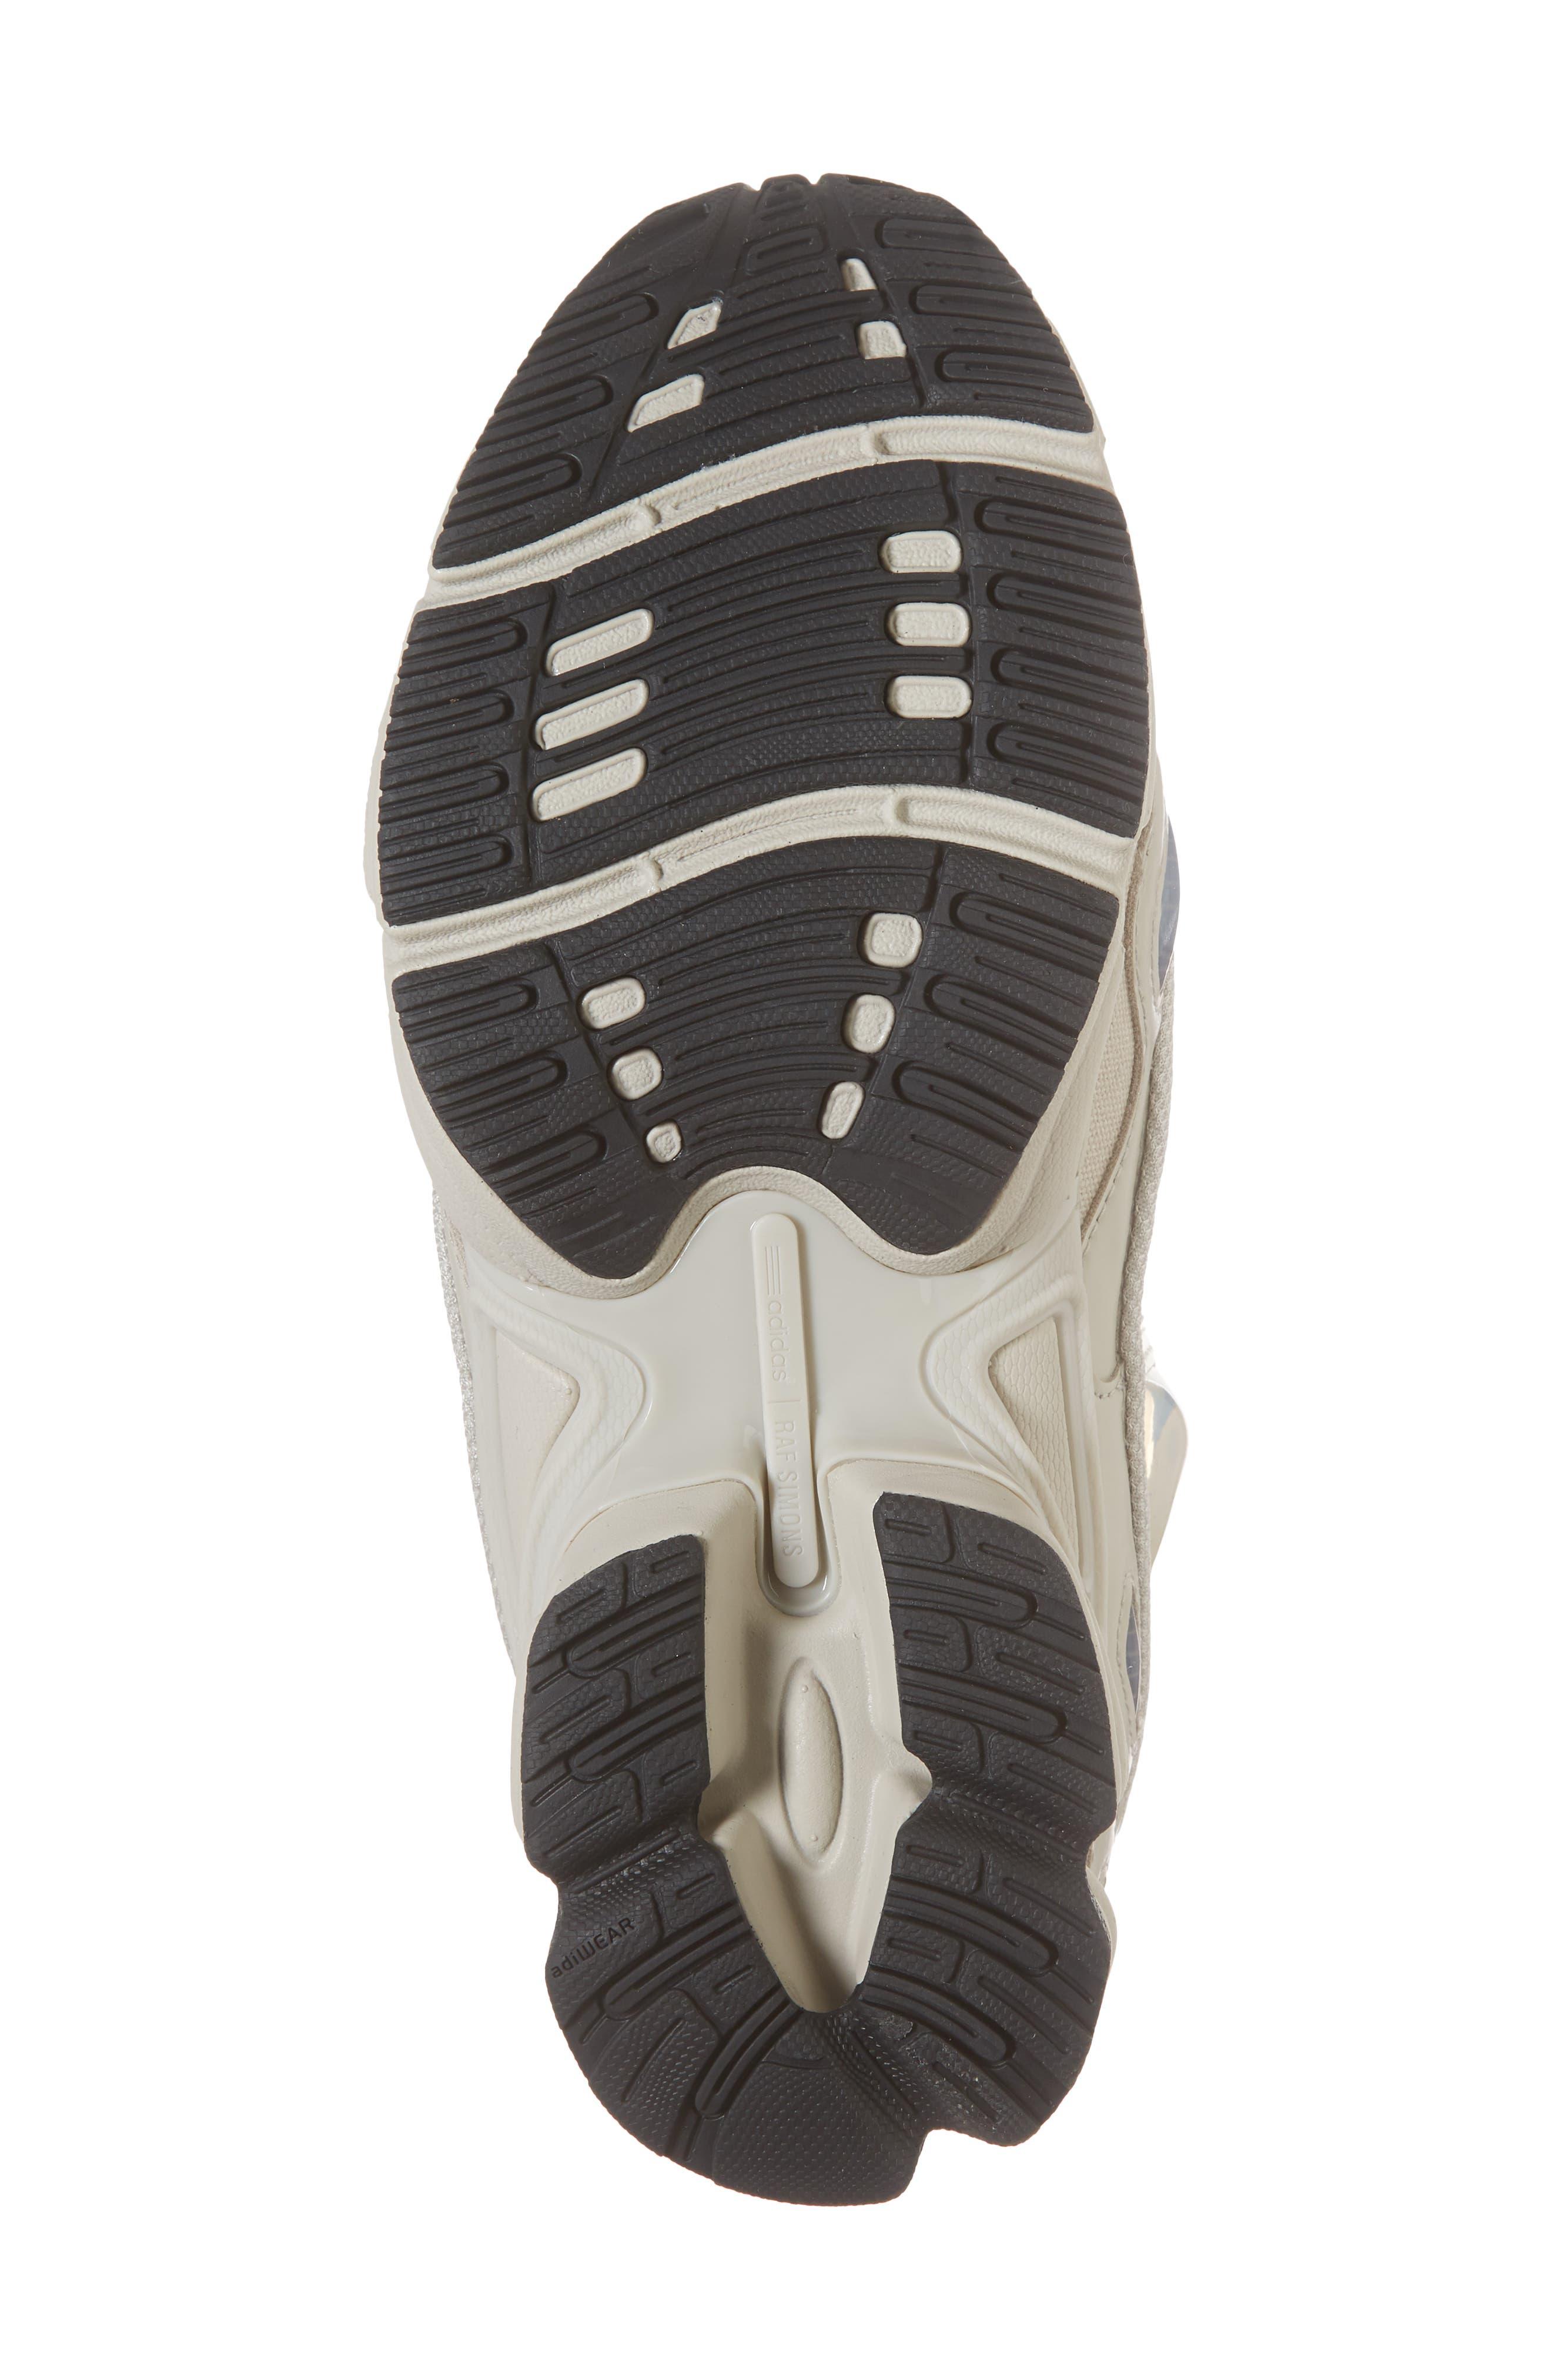 adidas by Raf Simons Ozweego III Sneaker,                             Alternate thumbnail 6, color,                             Cream White/ Mist Stone/ Black